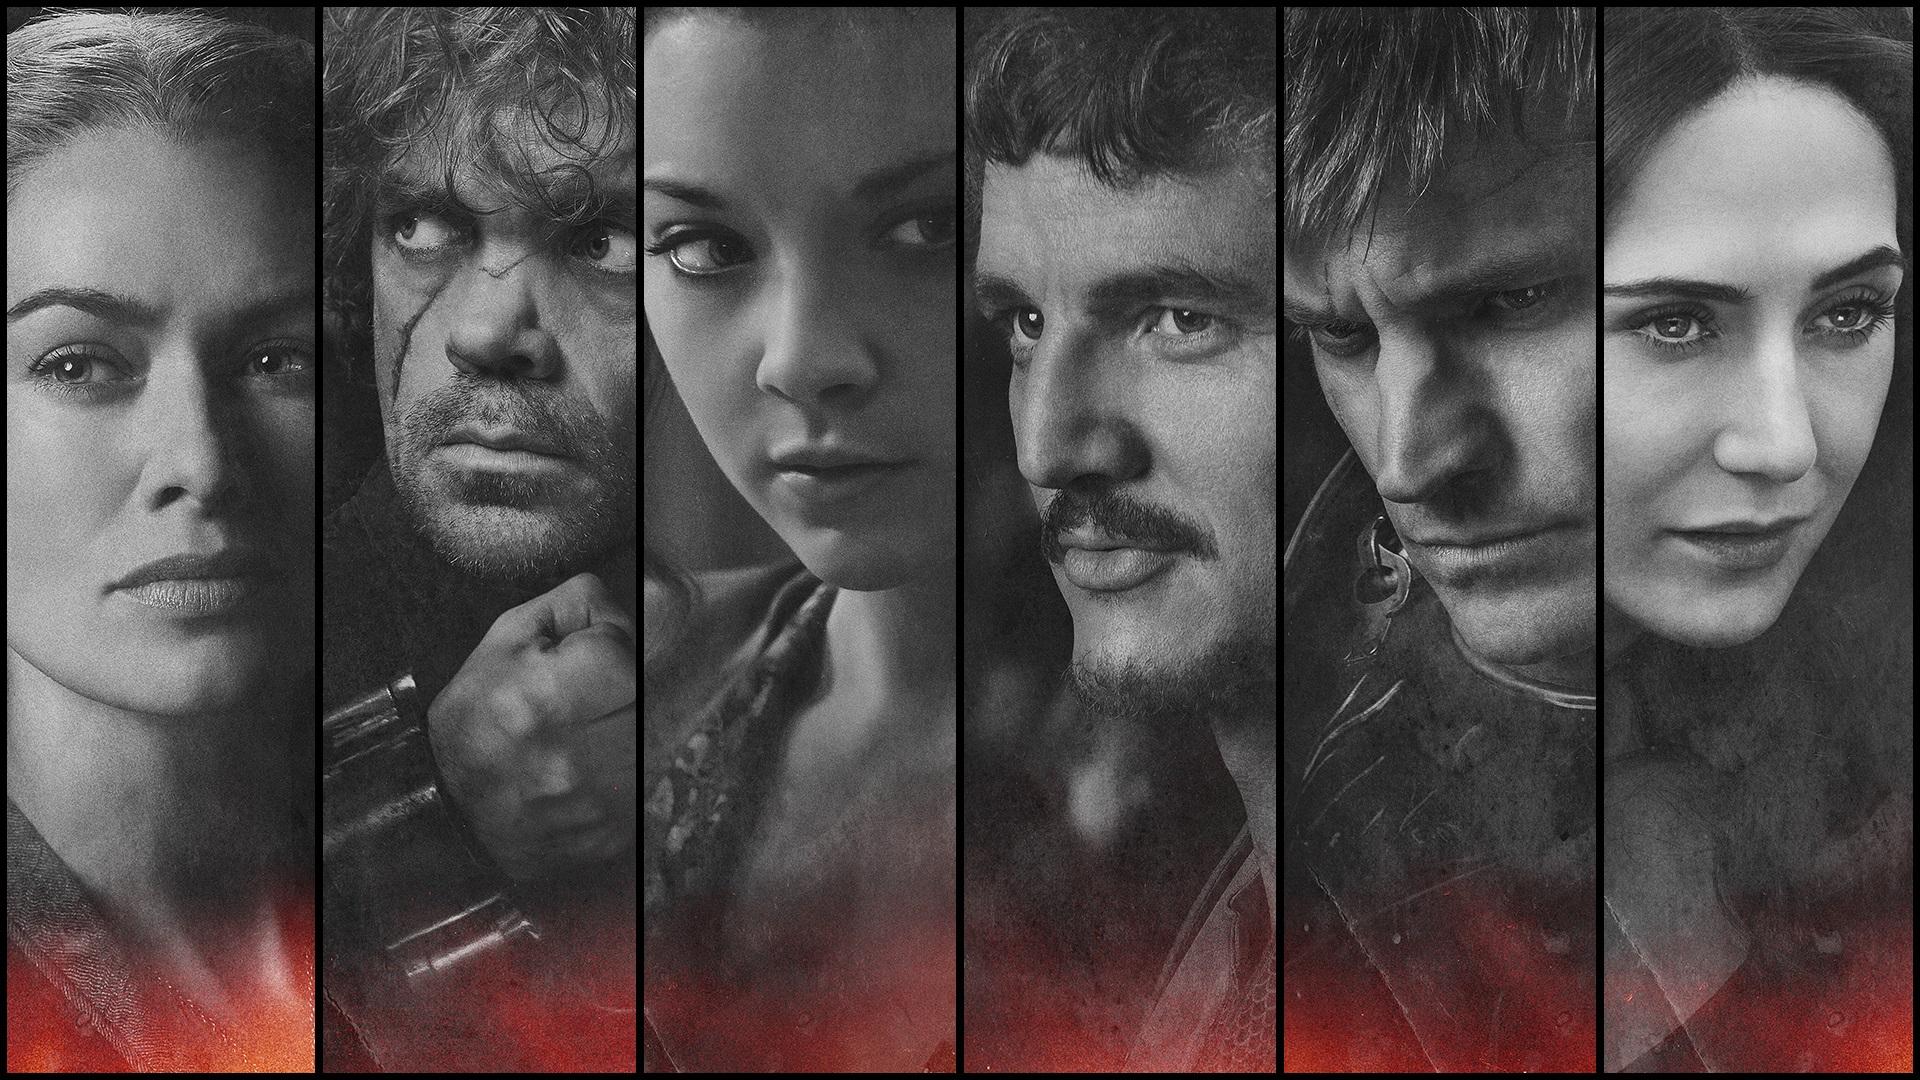 Game Of Thrones Season 4 Character Poster - HD Wallpaper